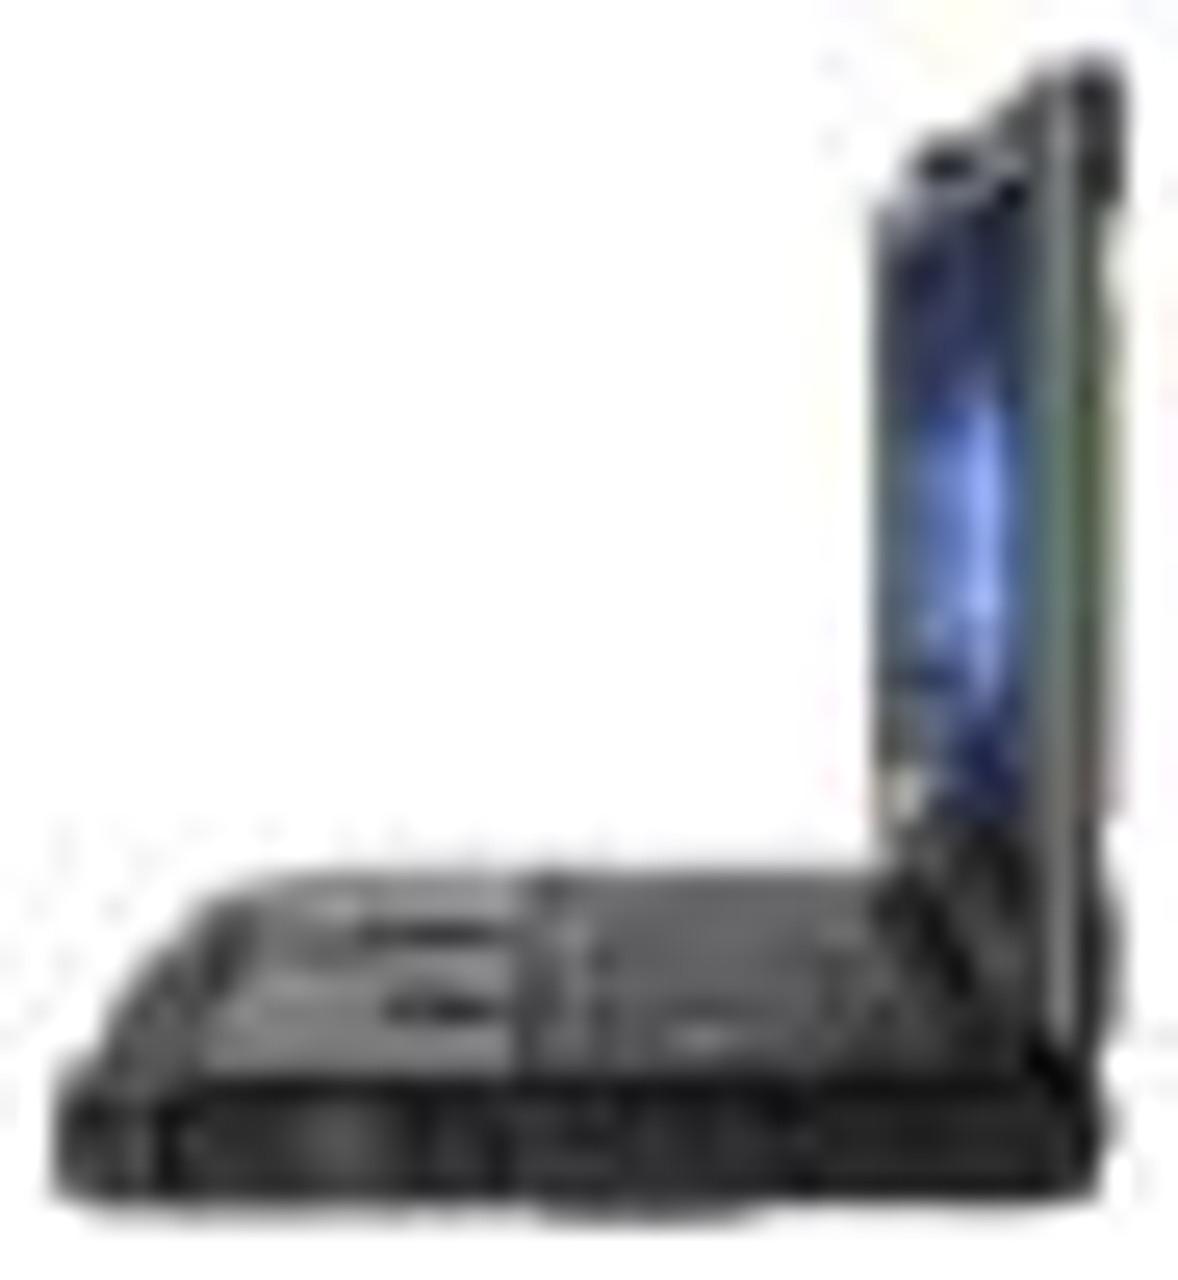 "Getac B300 G7 ,Intel Core i5-8250U Processor 1.6GHz,13.3"" (Without Webcam), Windows 10 Pro x64 with 8GB RAM ,256GB SSD,STD LCD,US KBD+US Power cord,Membrane Backlit KBD,Wifi+BT,HDMI,PCMCIA, Express Card 54, SD Card Reader, TPM 2.0, Low Temp -29°C, IP"